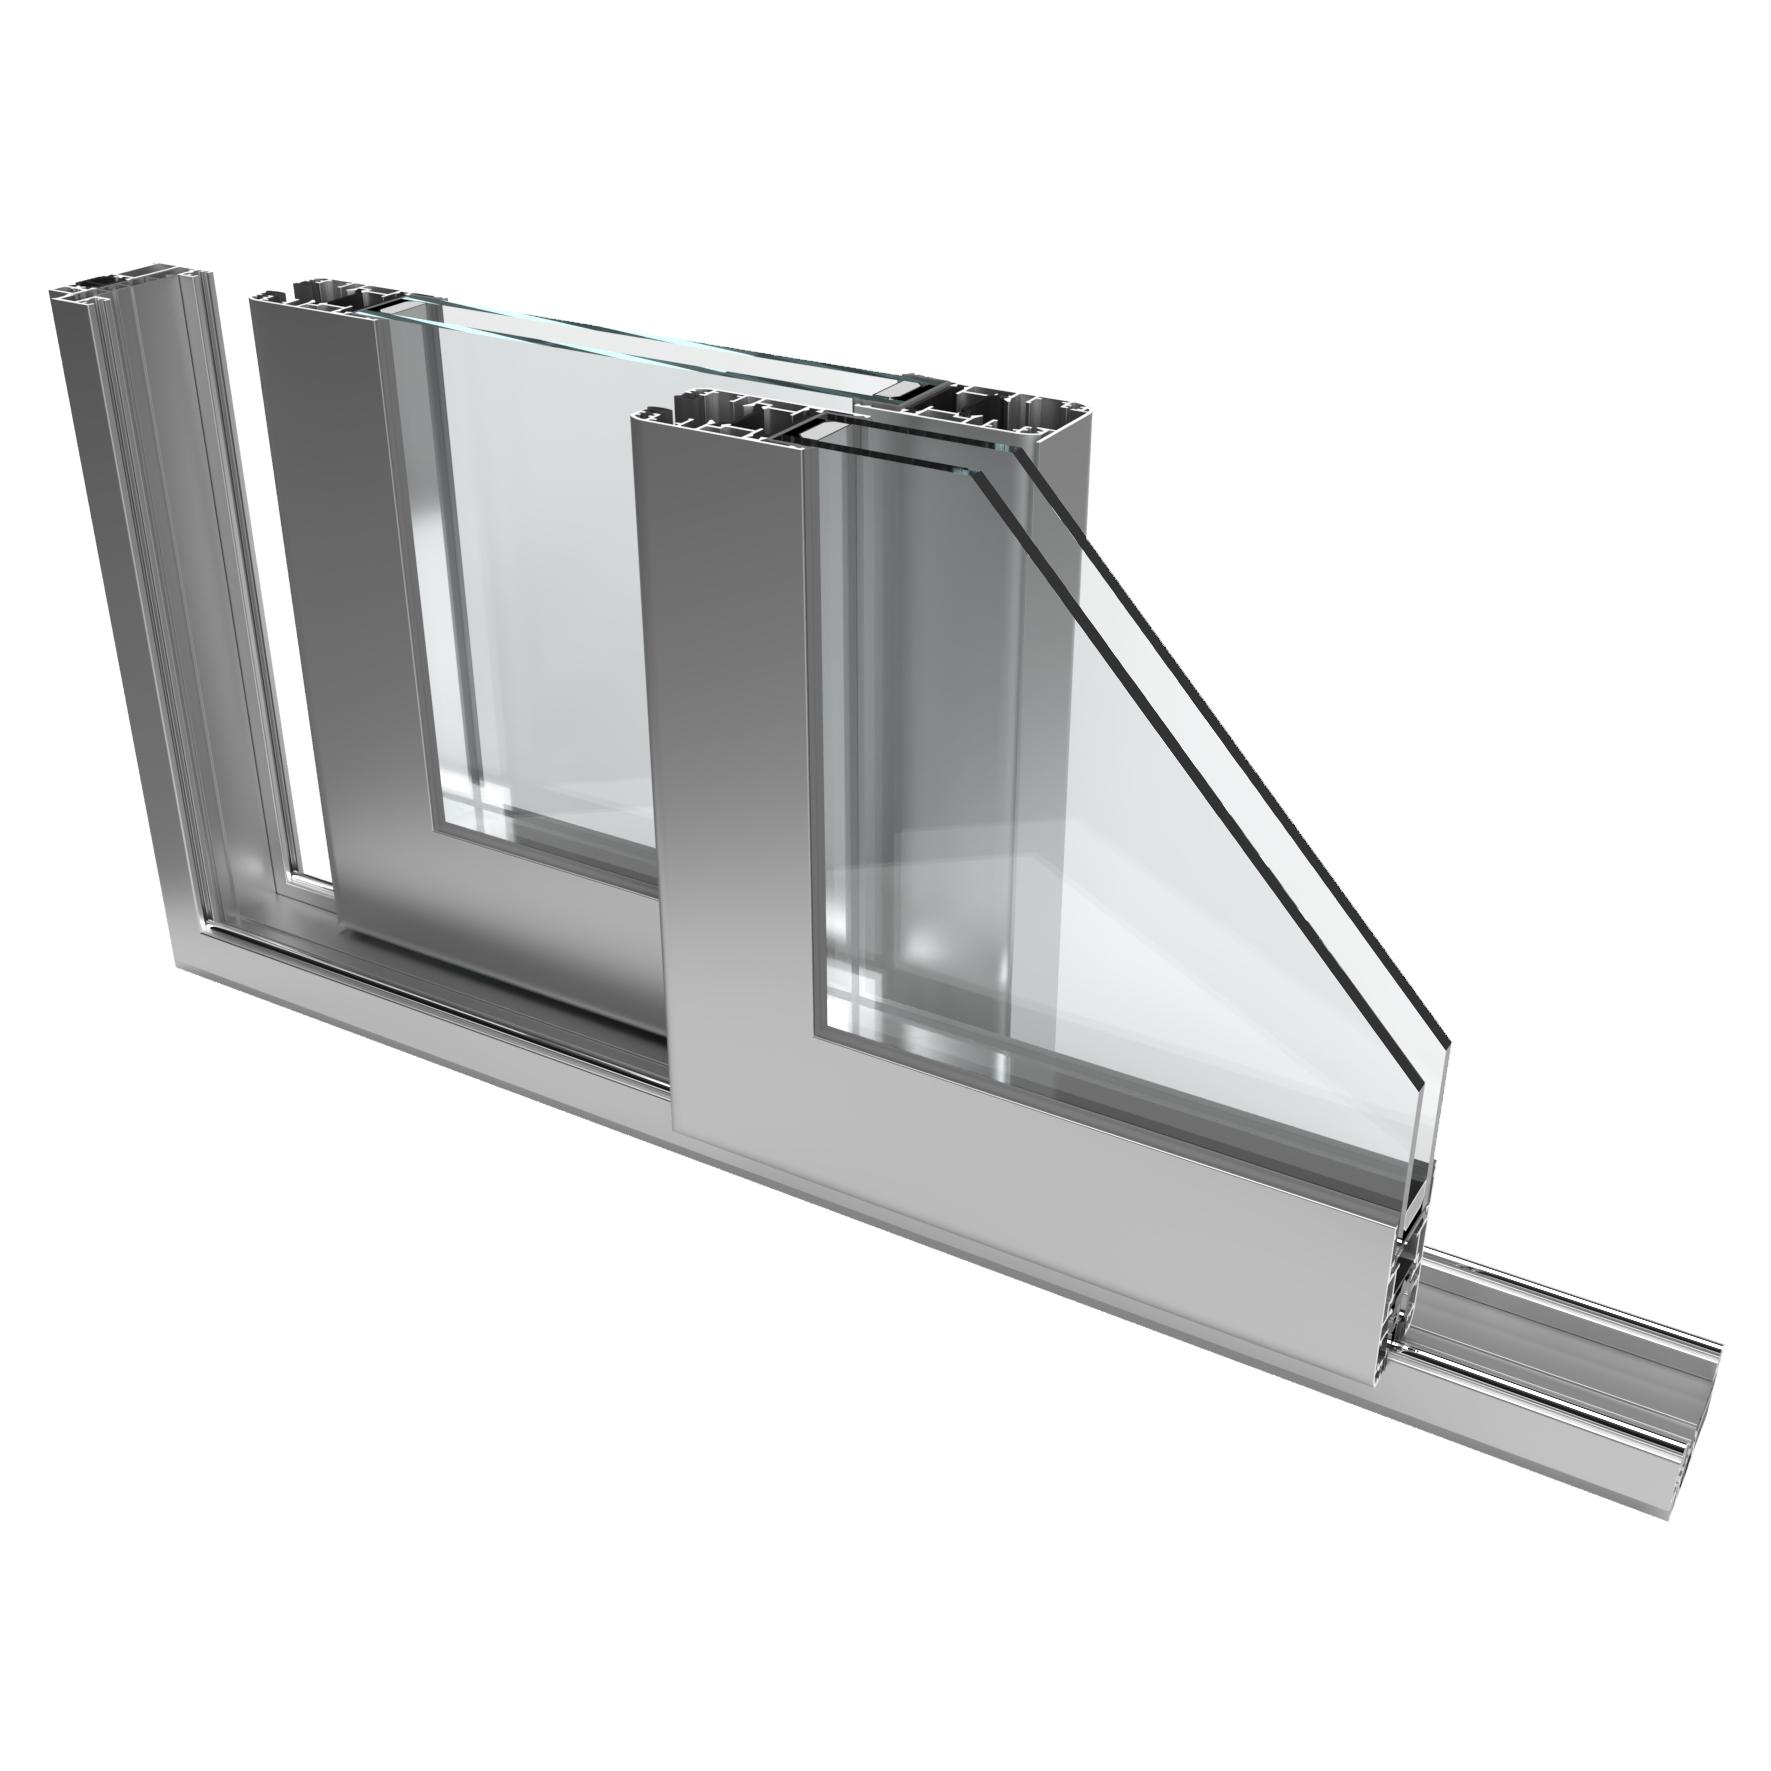 https://www.allpaint.it/wp-content/uploads/2021/07/scorrevoli-alluminio-gs60light-allpaint.jpg